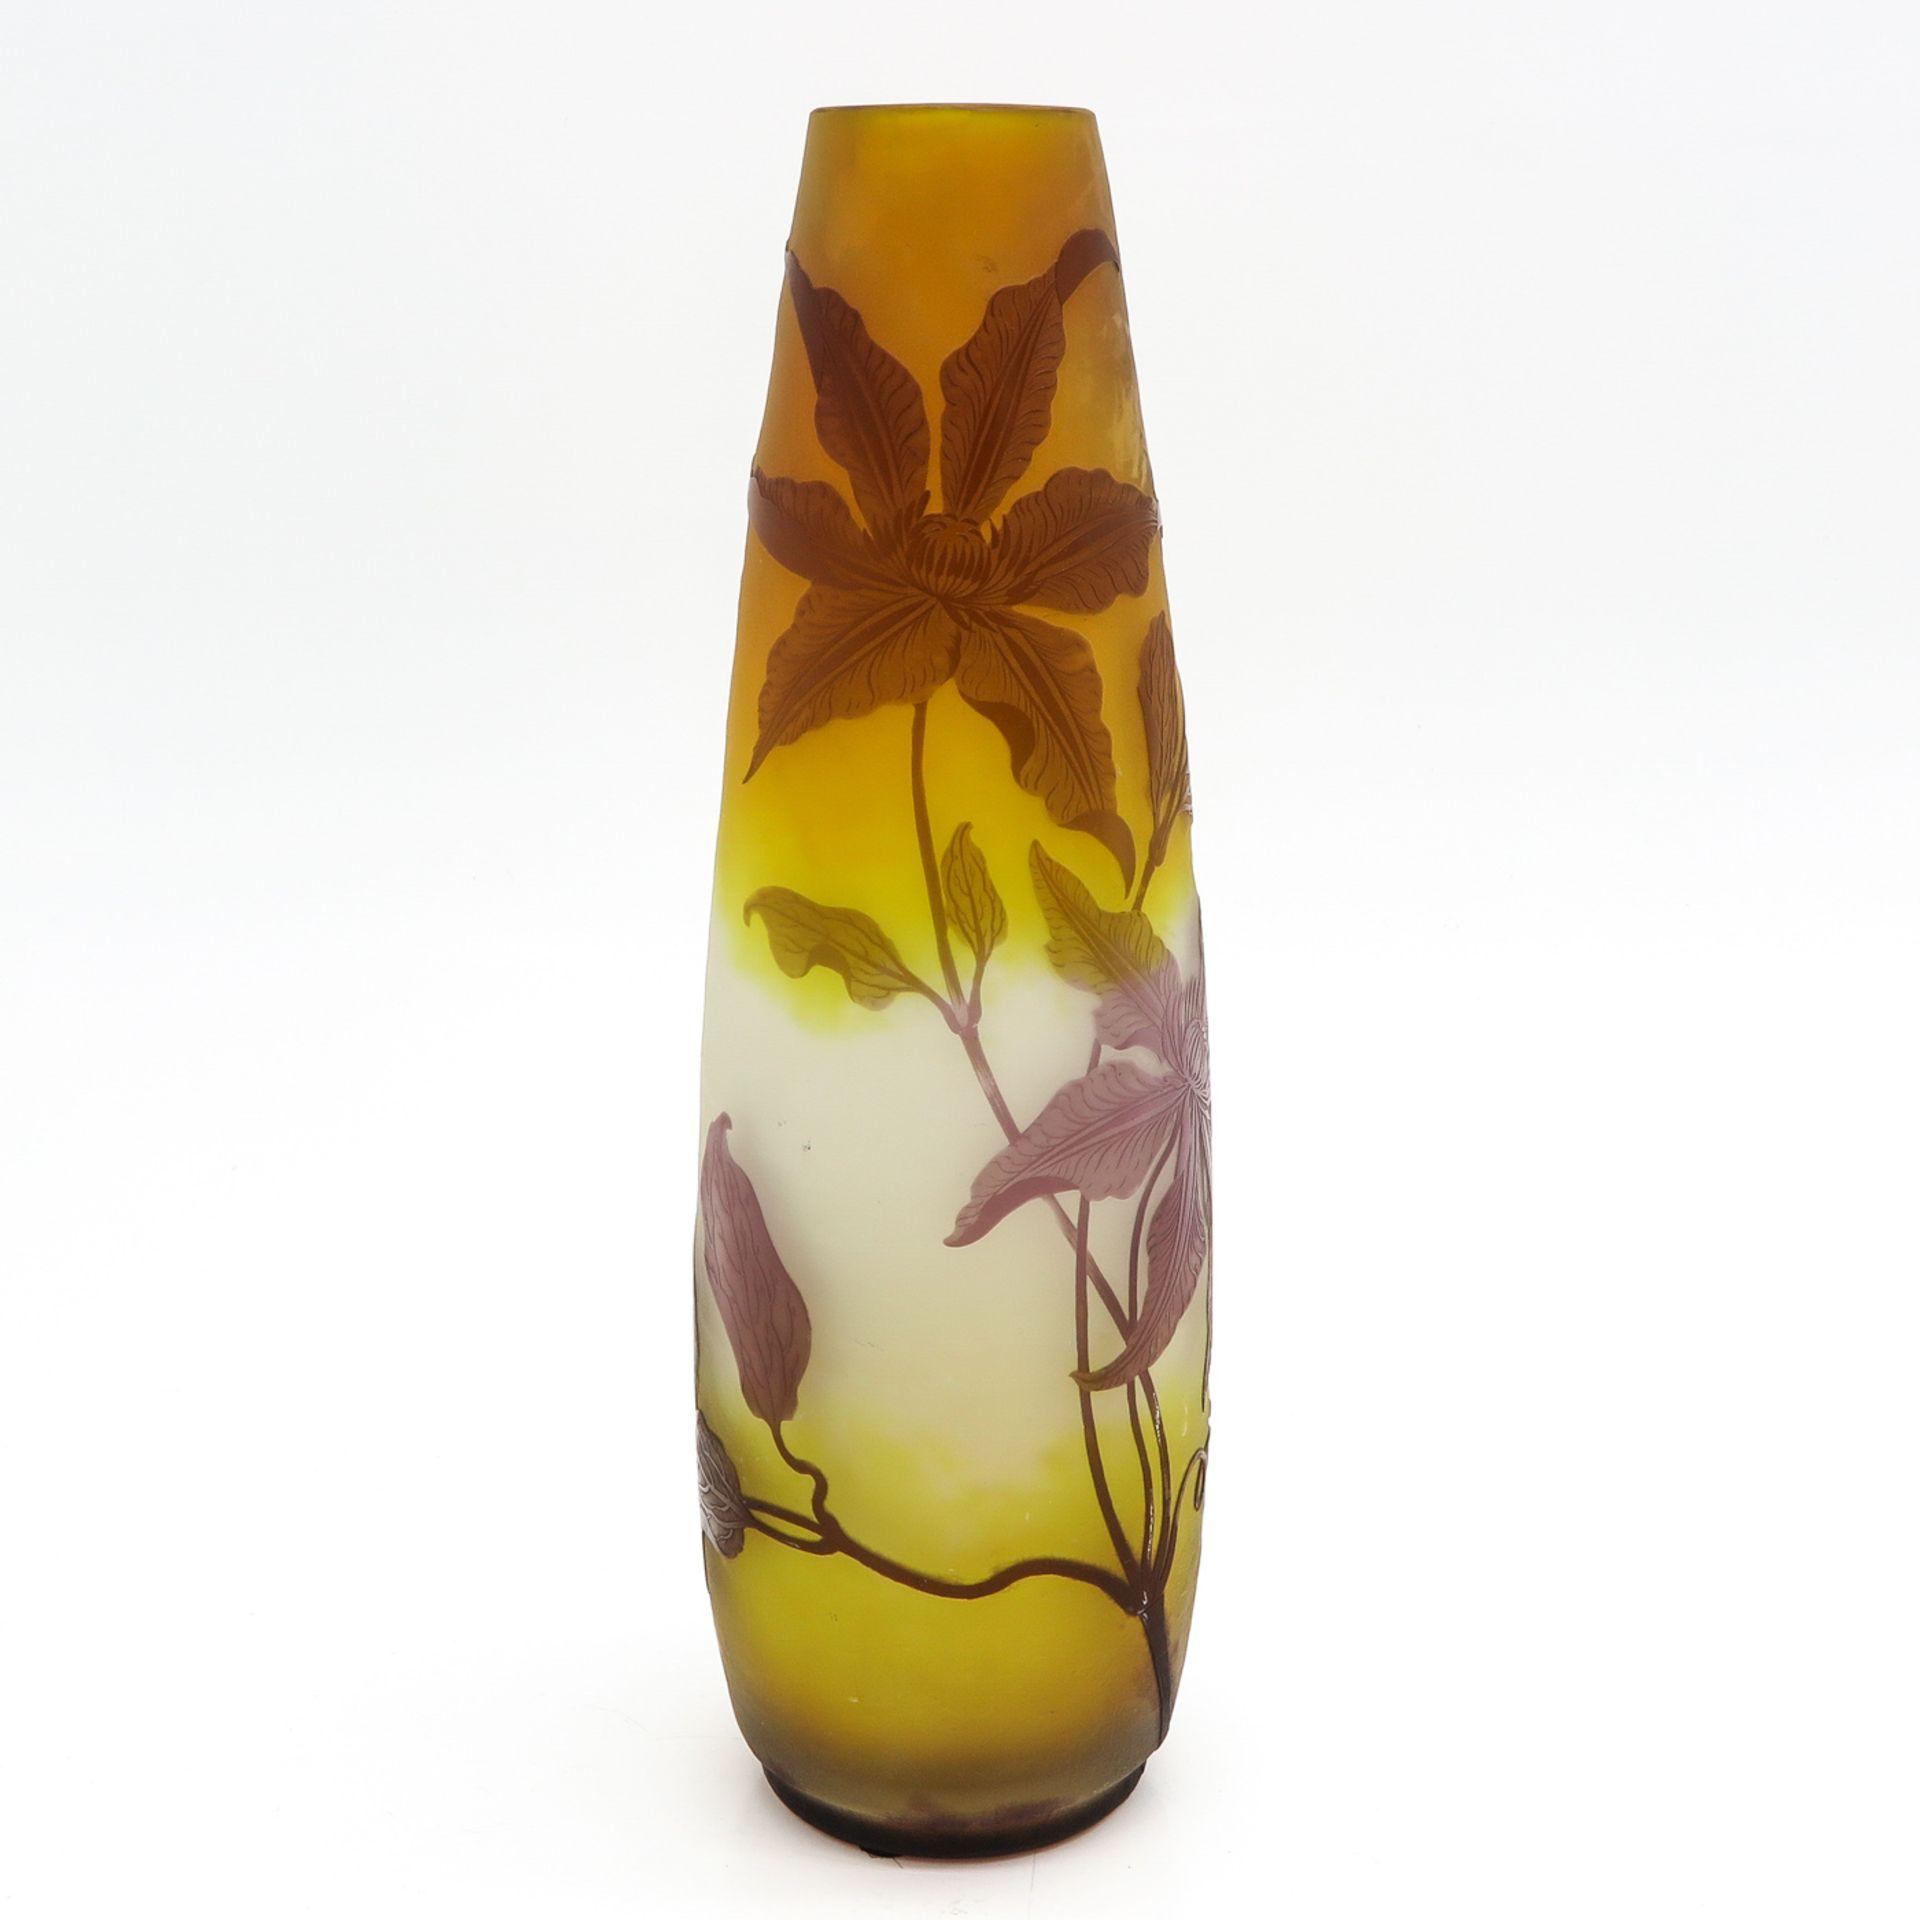 Los 1023 - A Signed Galle Vase